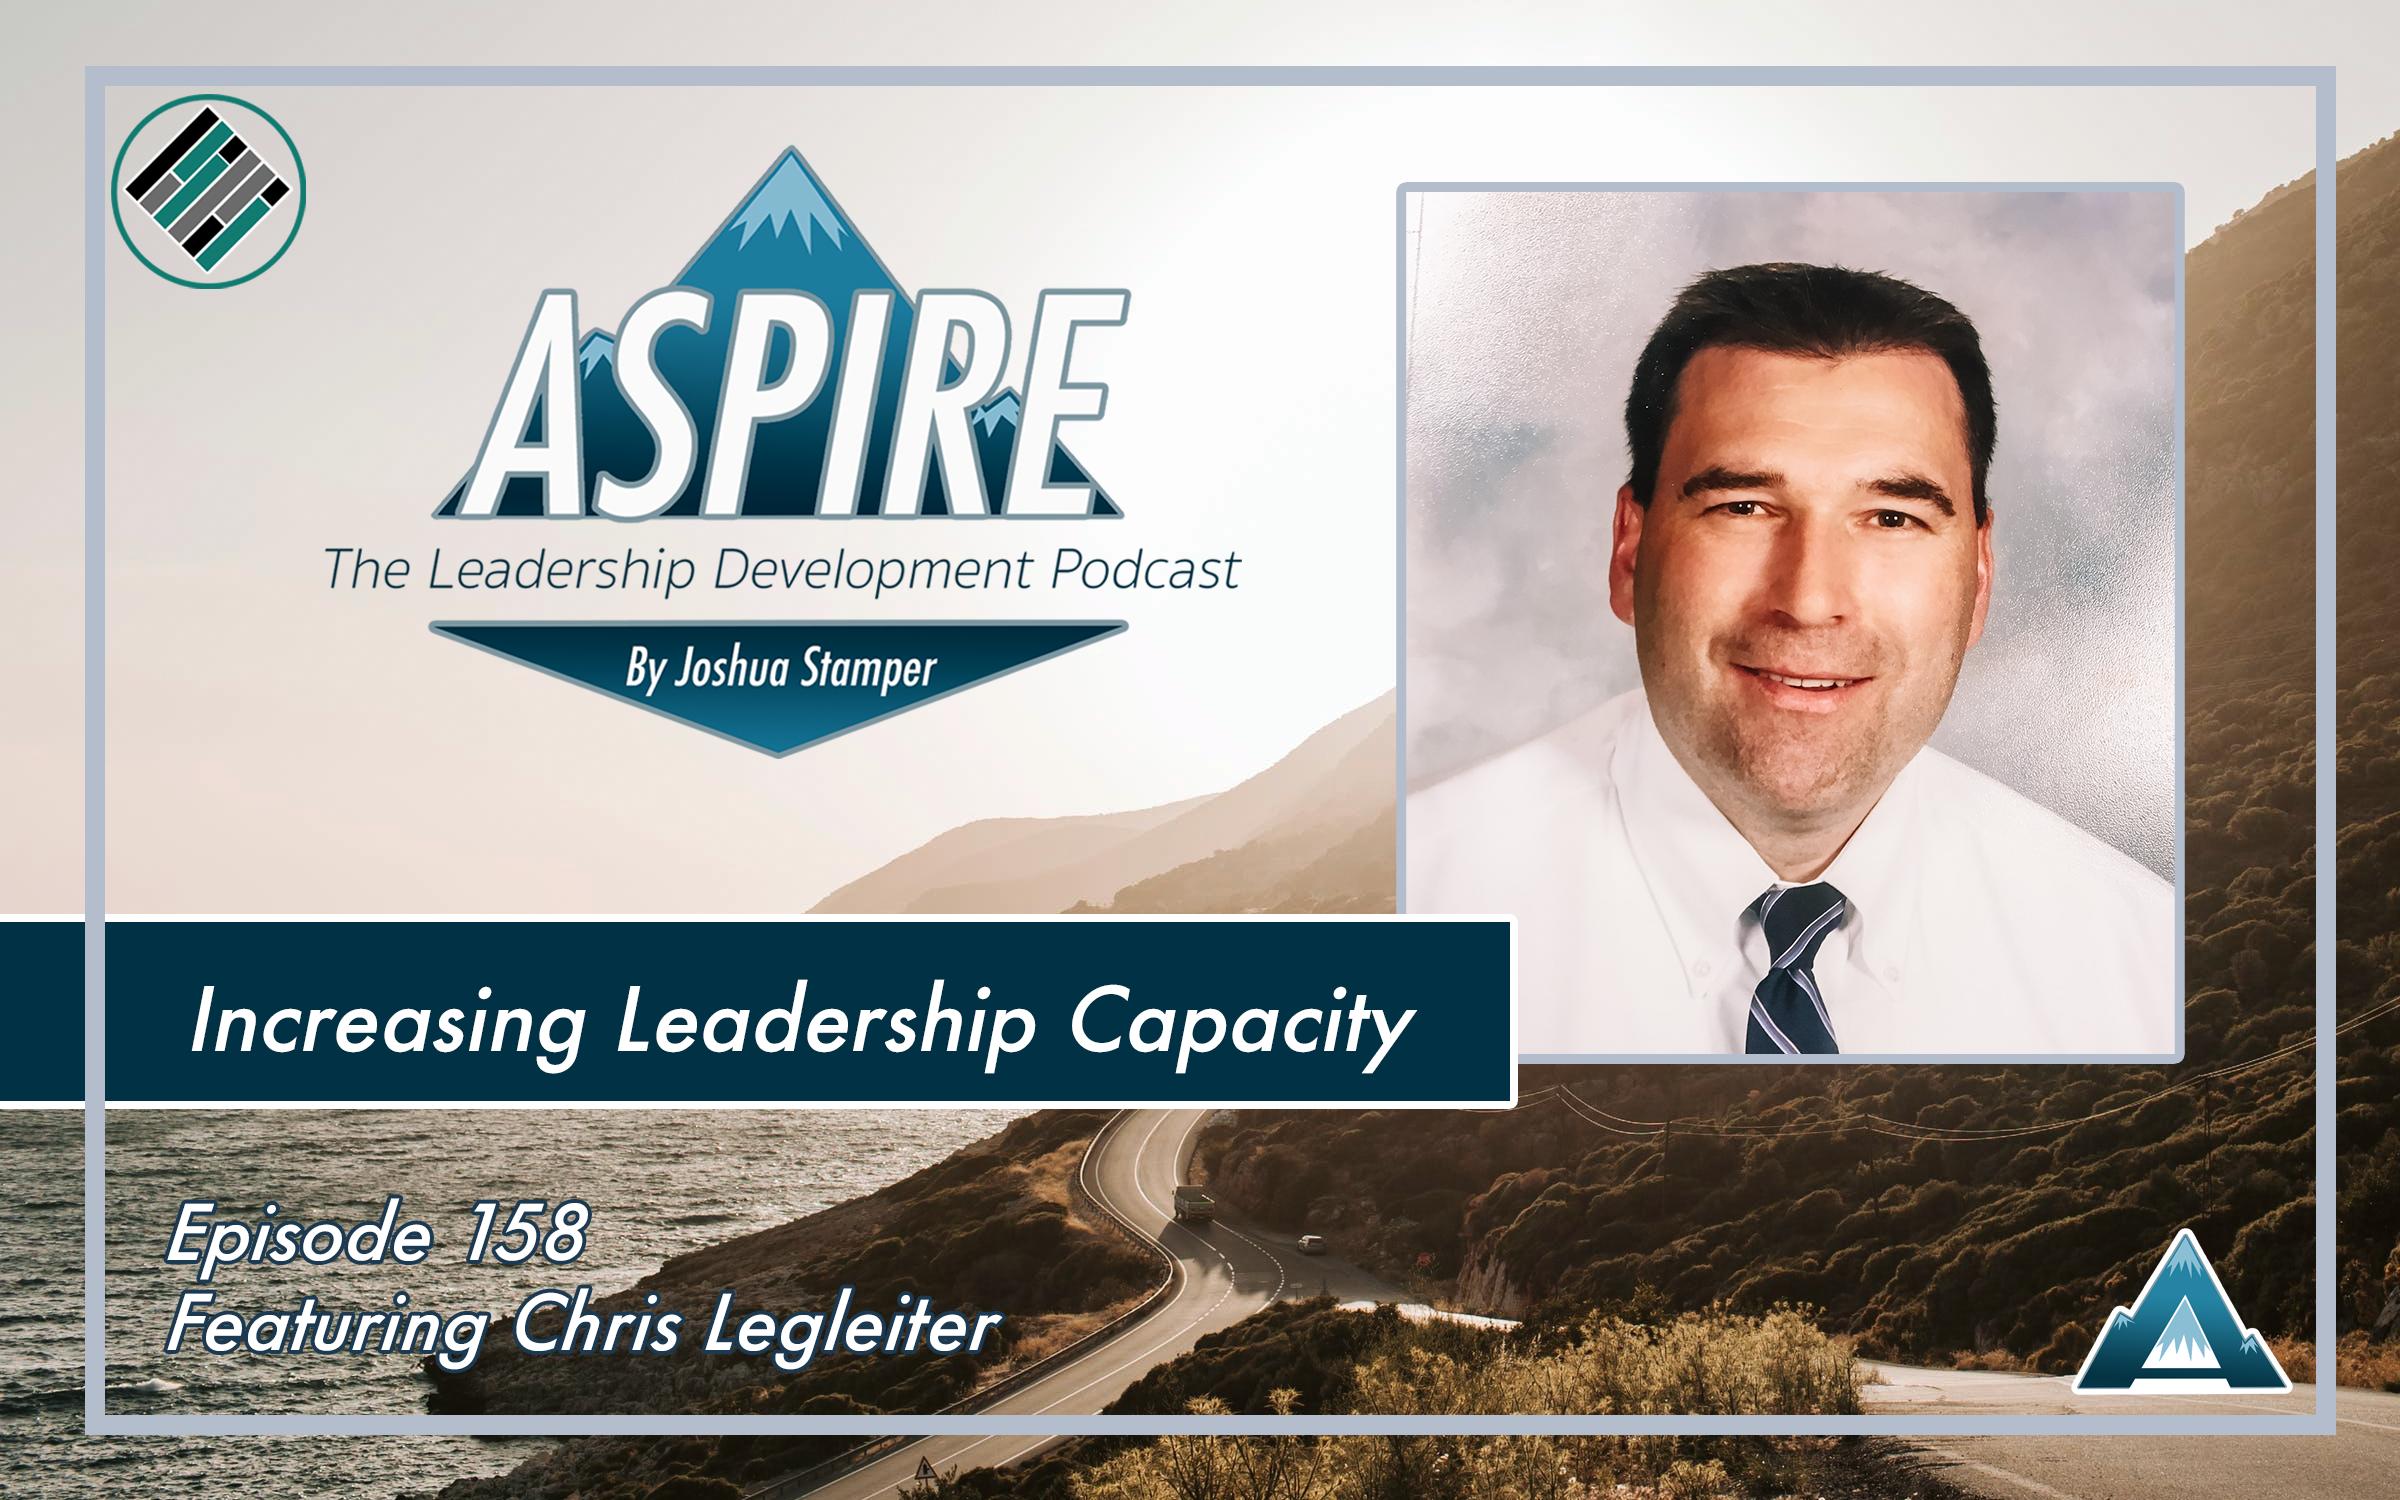 Joshua Stamper, Chris Legleiter, Aspire: The Leadership Development Podcast, #AspireLead, Teach Better